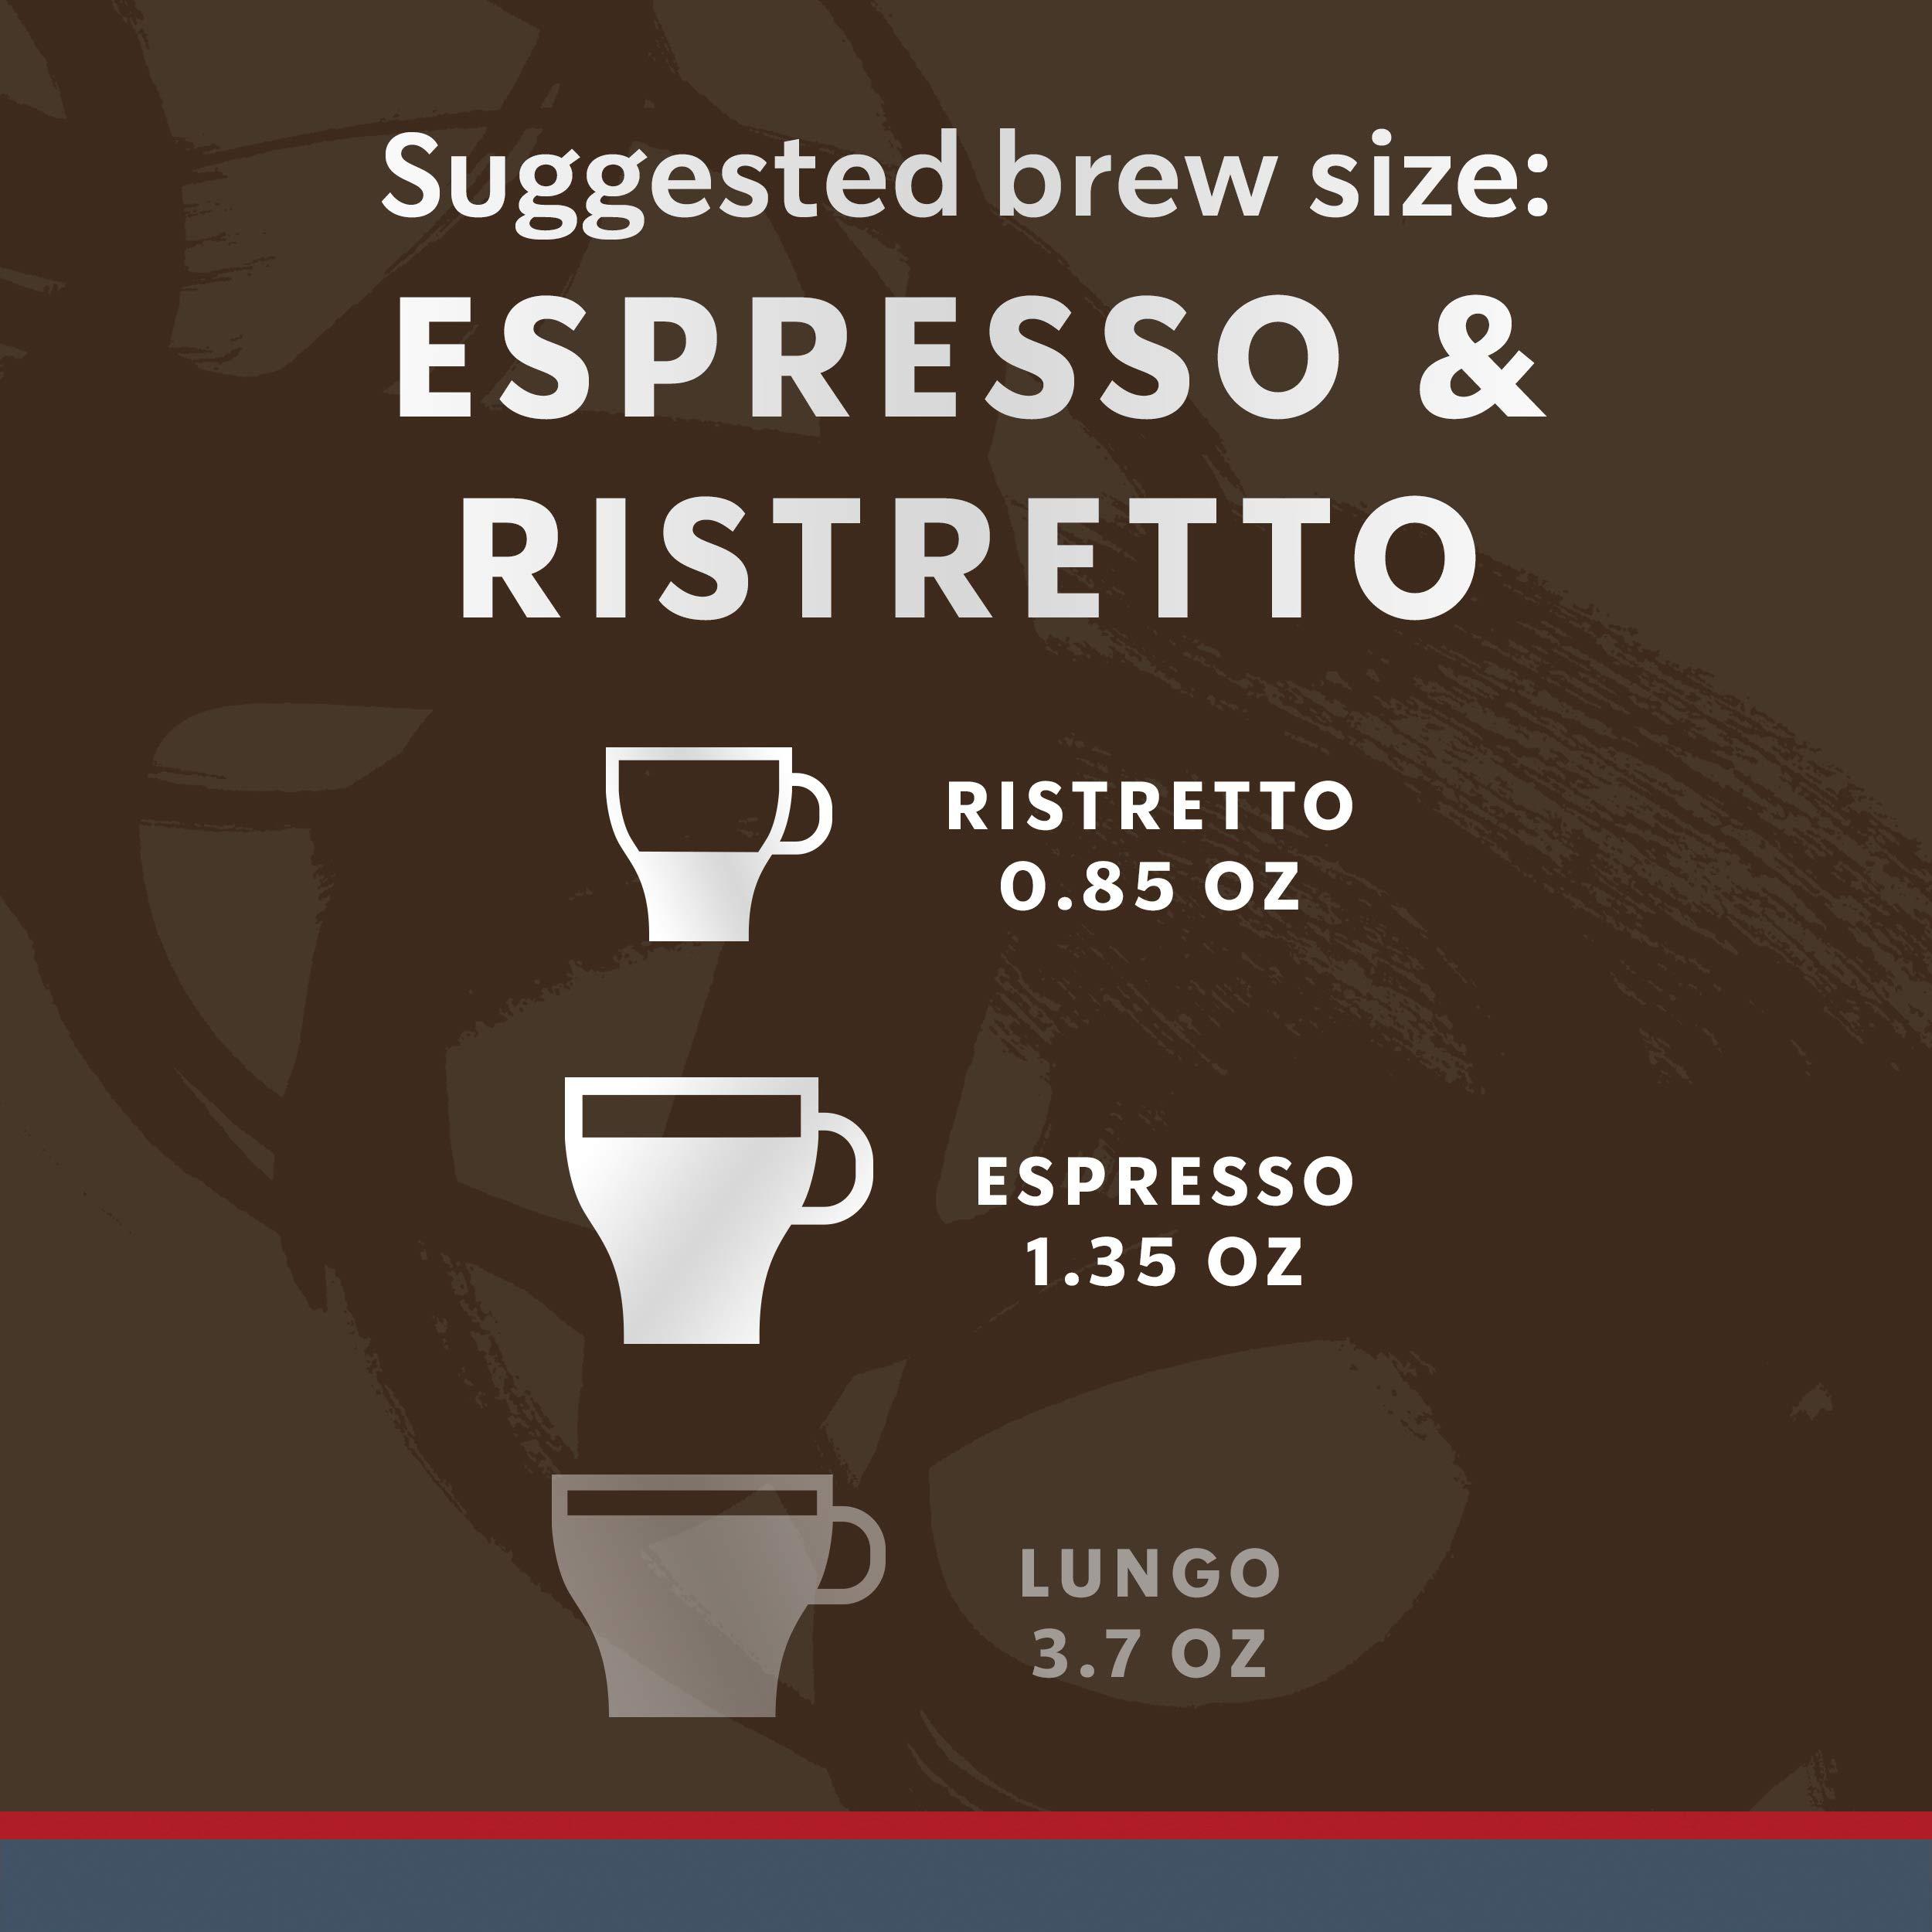 Starbucks by Nespresso, Decaf Espresso Dark Roast (50-count single serve capsules, compatible with Nespresso Original Line System) by Starbucks for Nespresso (Image #5)